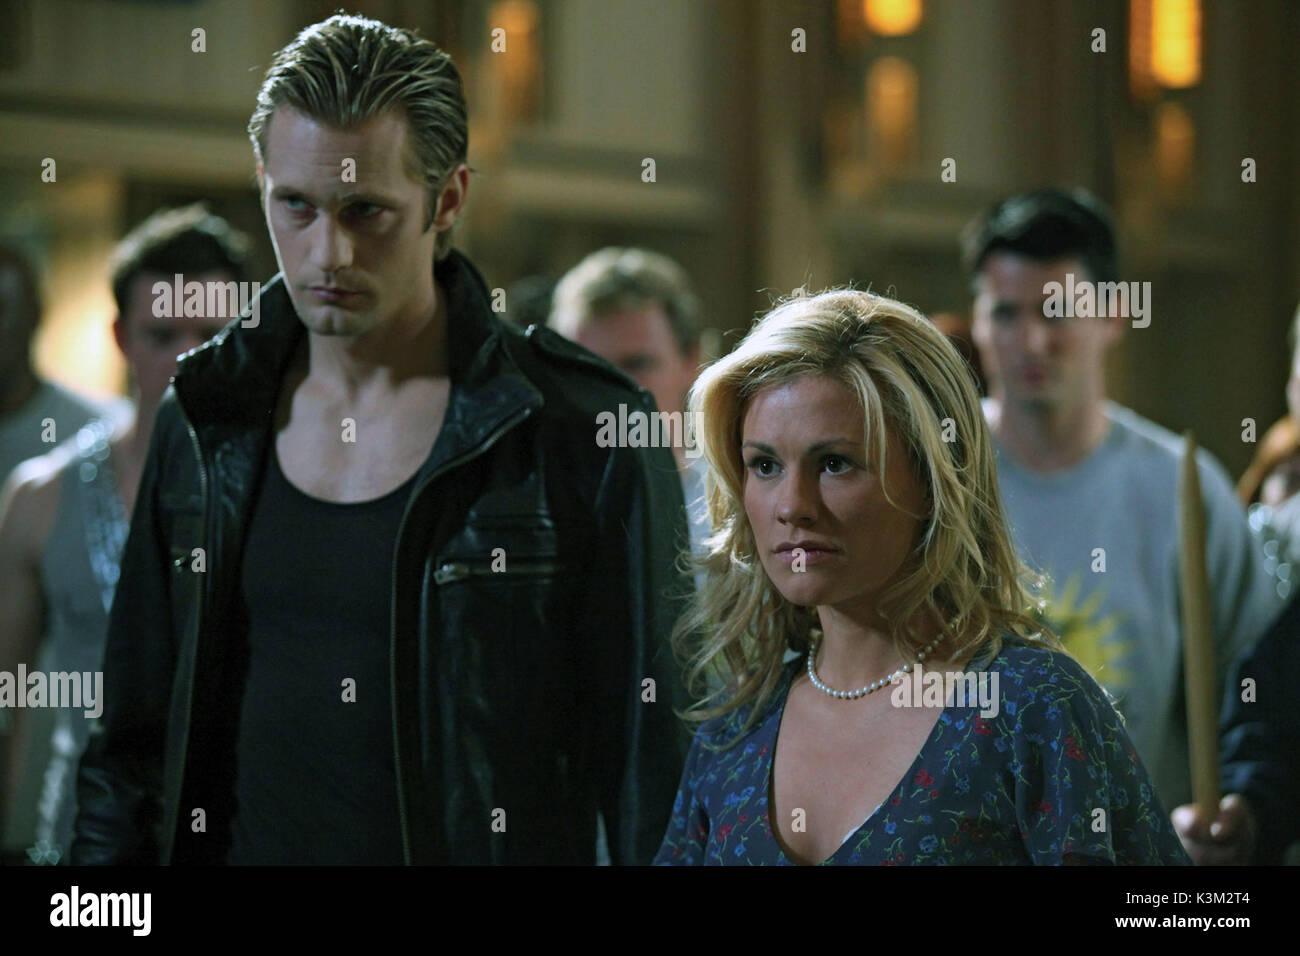 TRUE BLOOD Series,2 / Episode,8 / Timebomb ALEXANDER SKARSGARD as Eric Northman, ANNA PAQUIN as Sookie Stackhouse - Stock Image